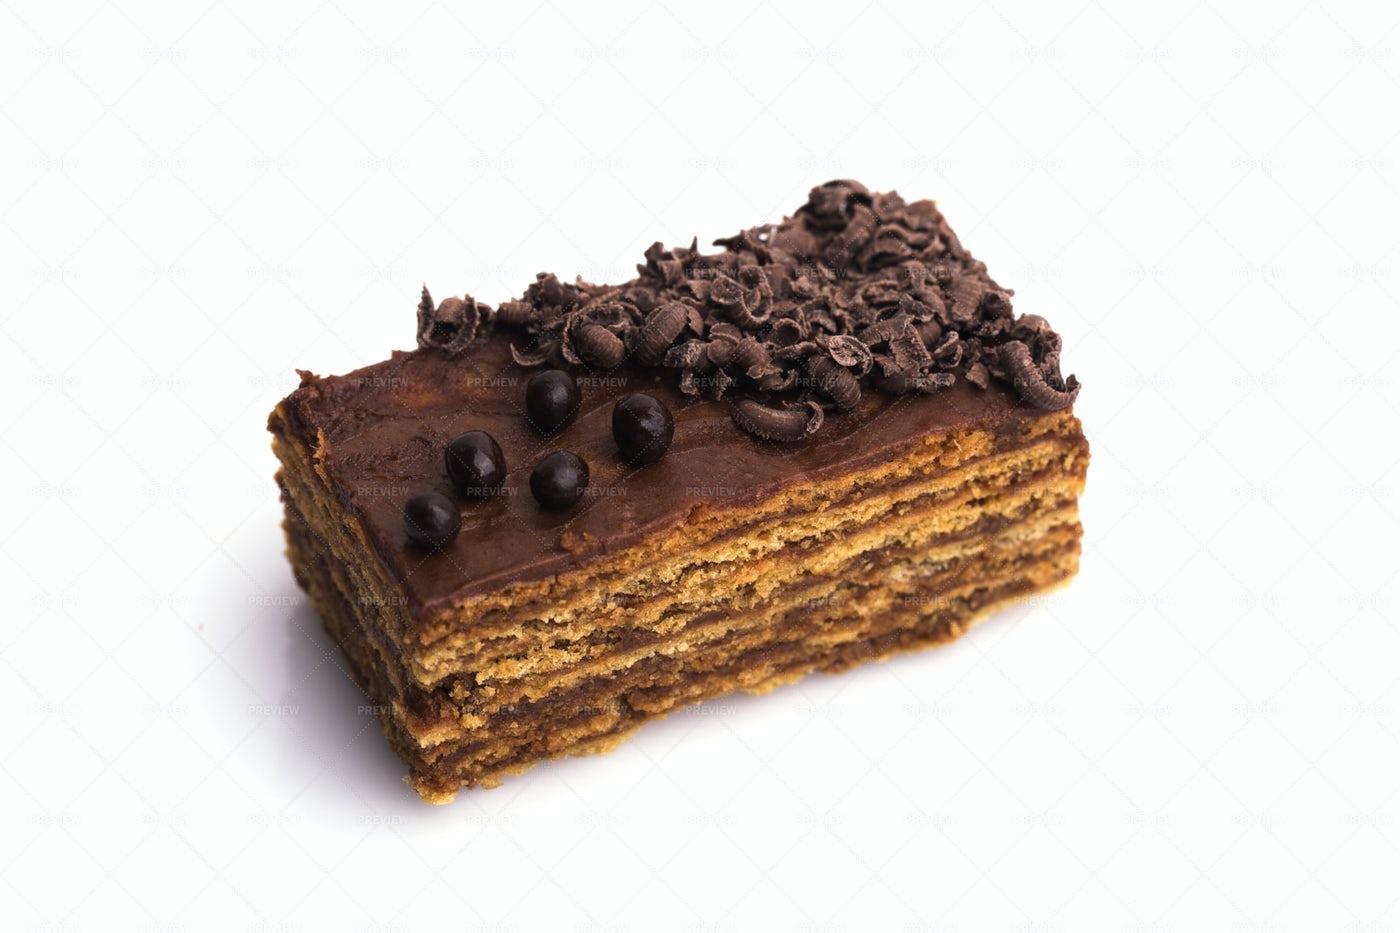 A Slice Of Chocolate Cake: Stock Photos